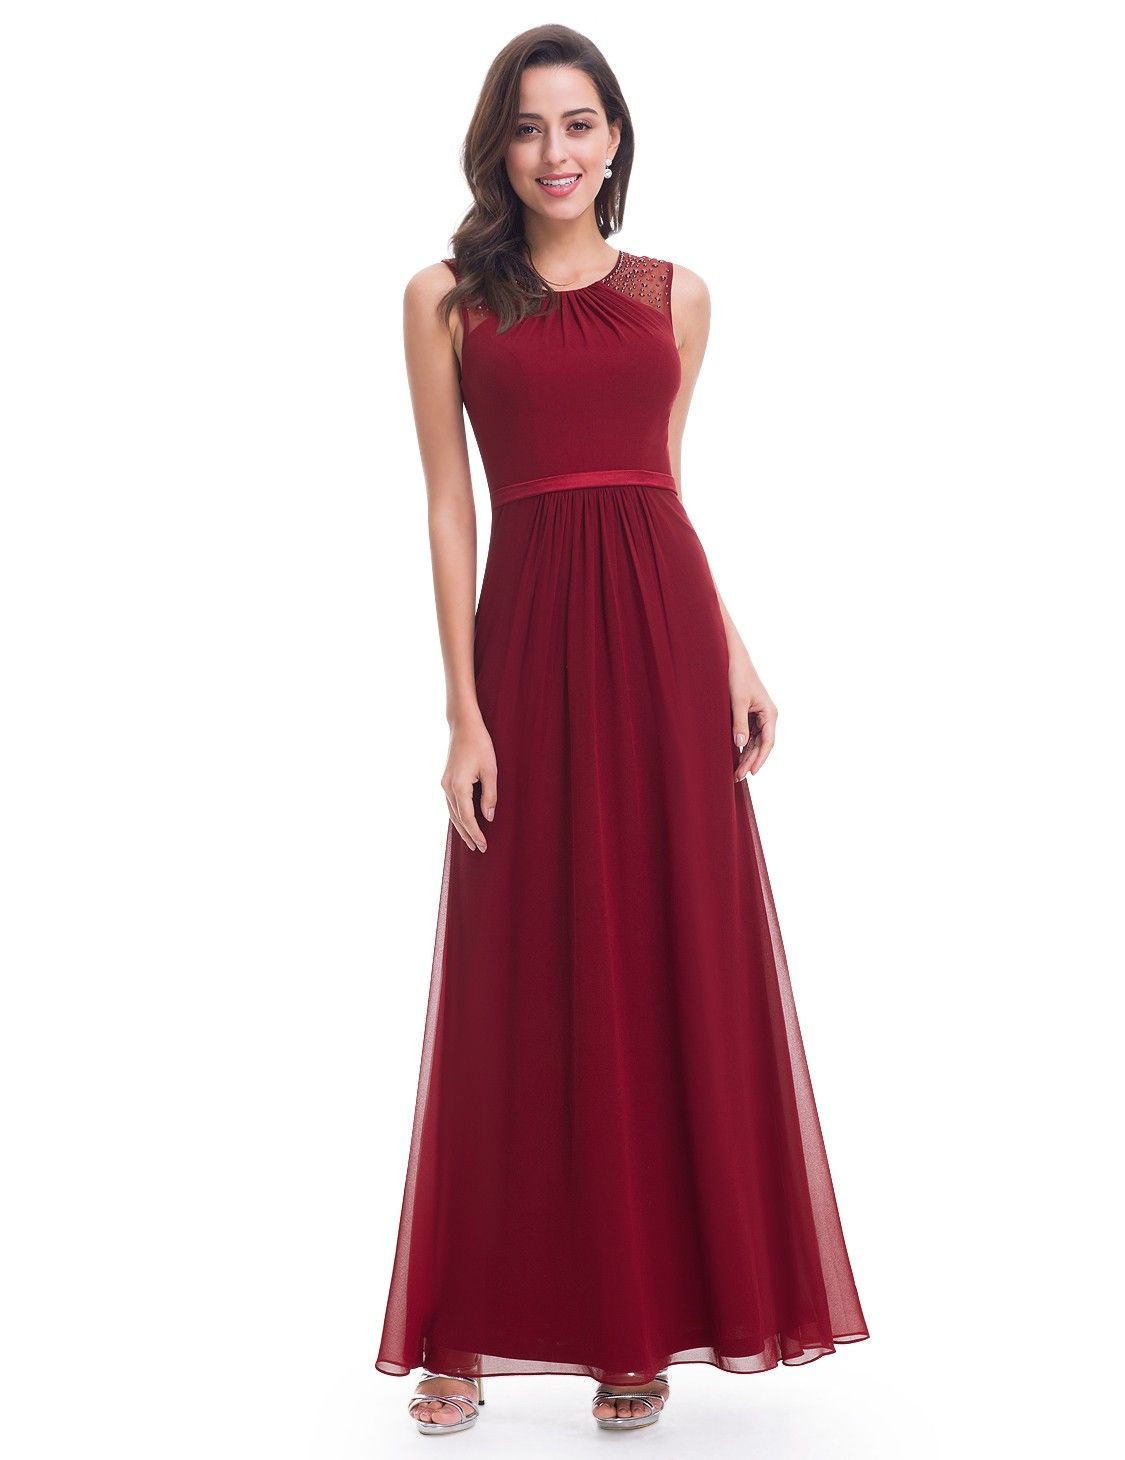 Women's Elegant Sleeveless Long Evening Party Dress | Ever ...